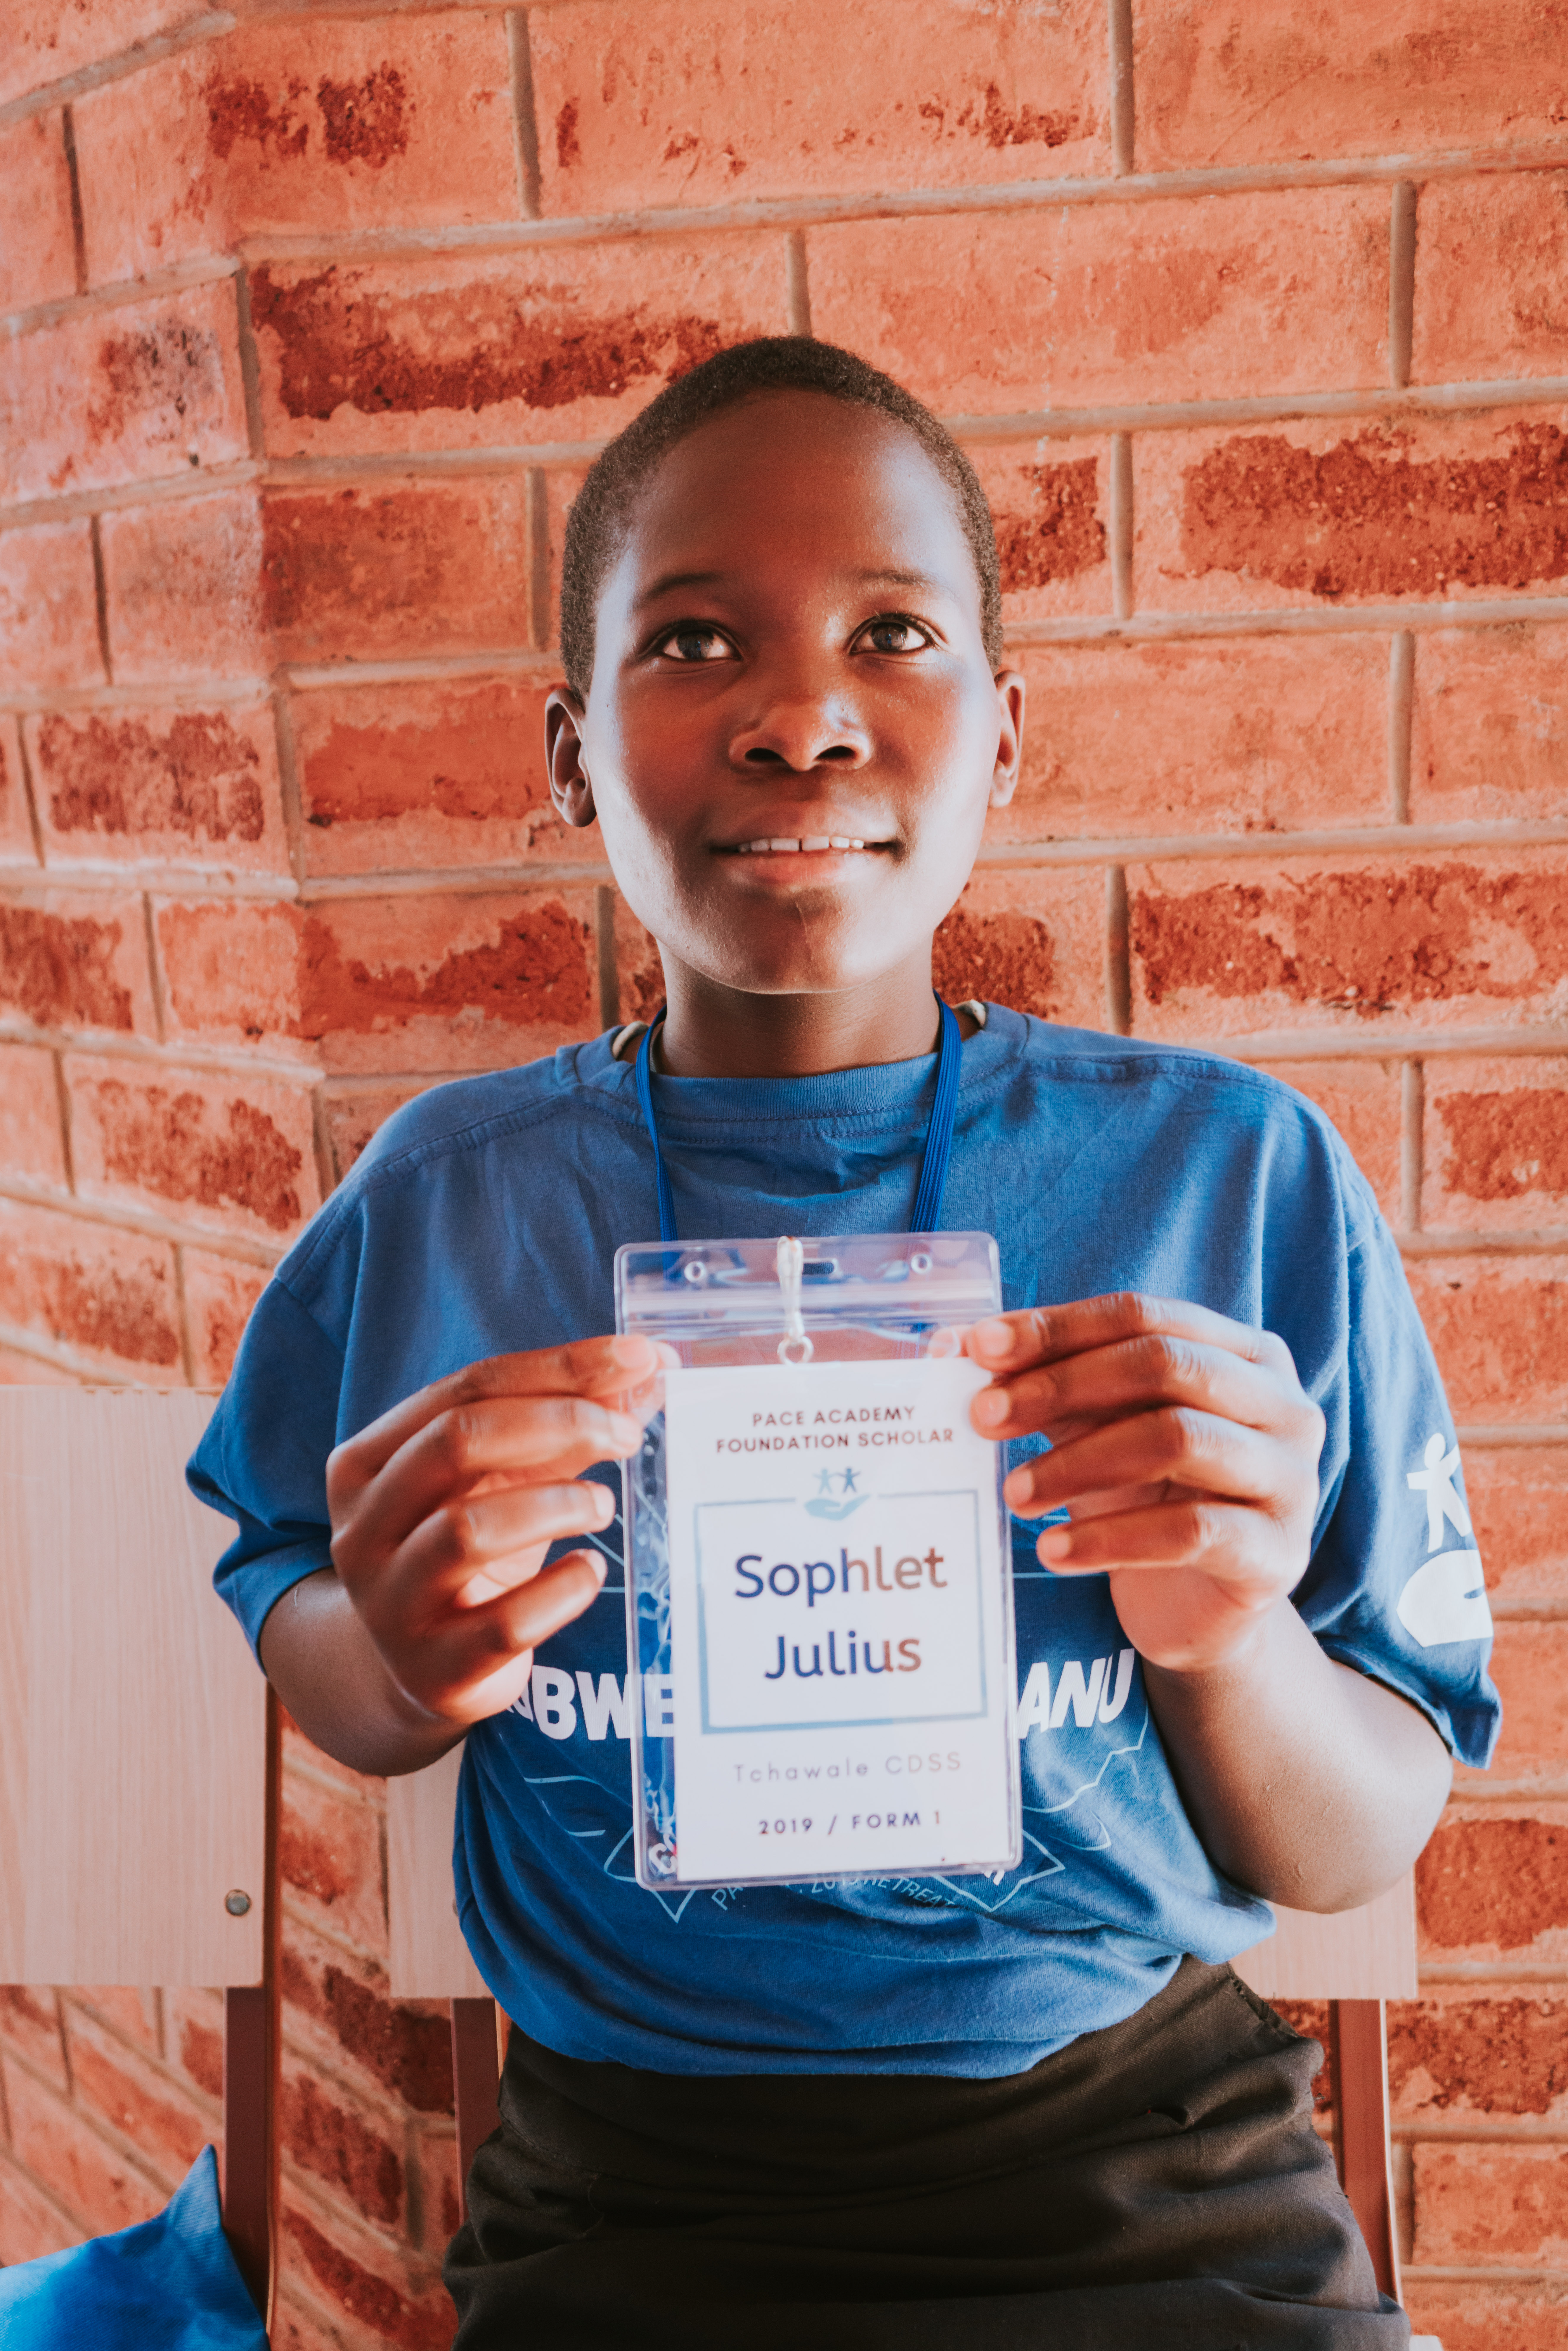 Sophlet Julius (Tchawale CDSS)